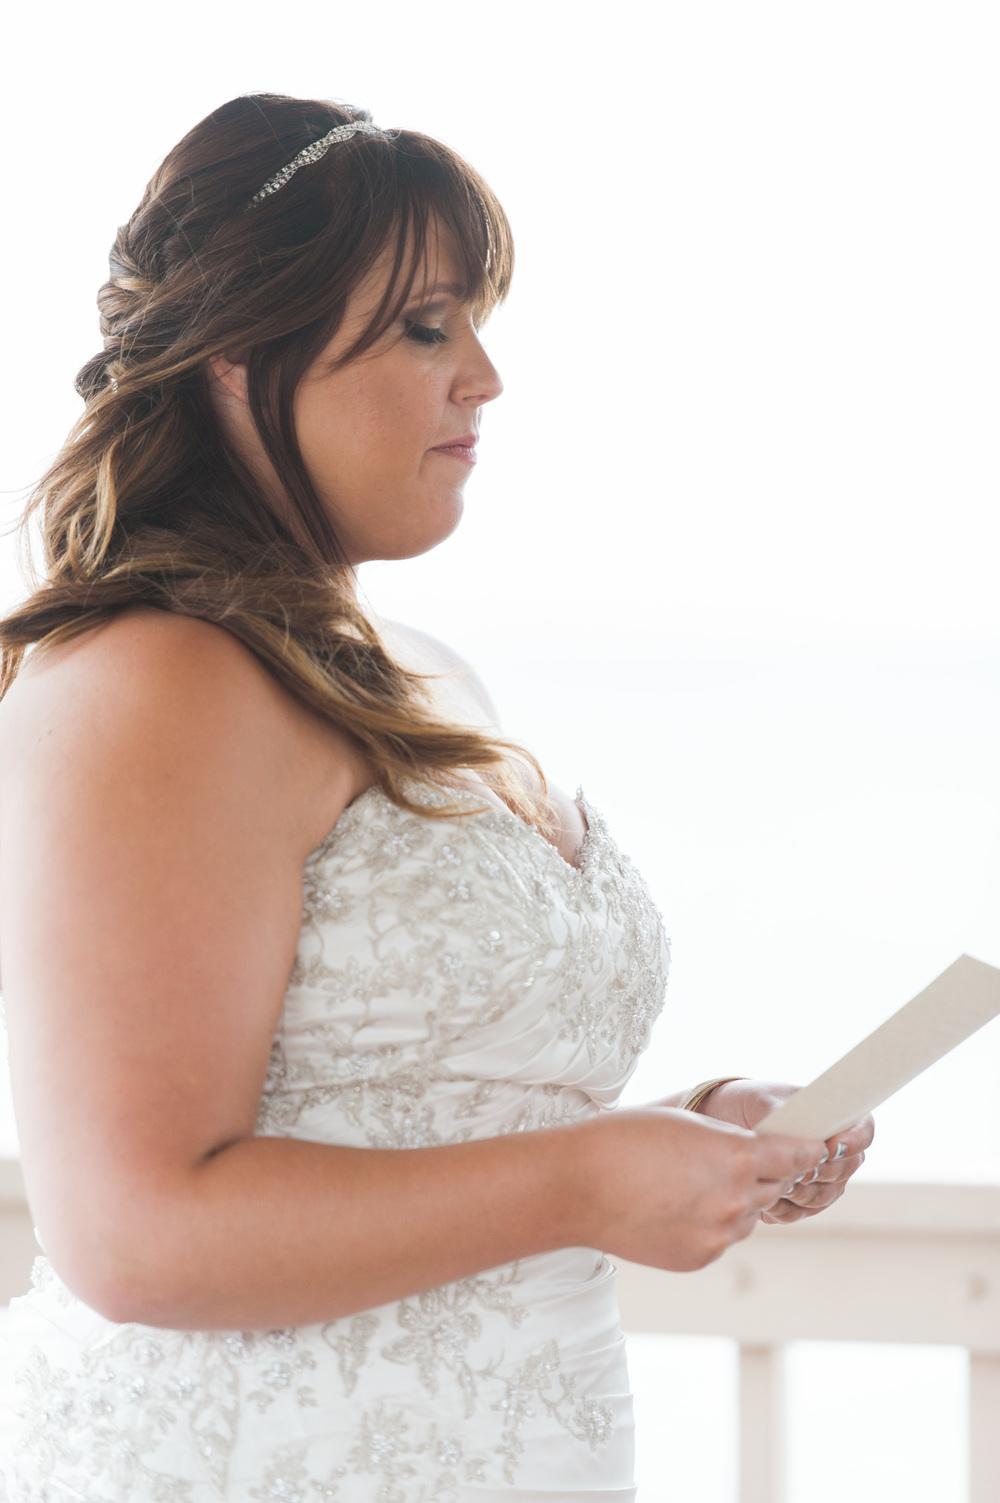 Pismo Beach, CA Wedding Photographer | Jennifer Lourie